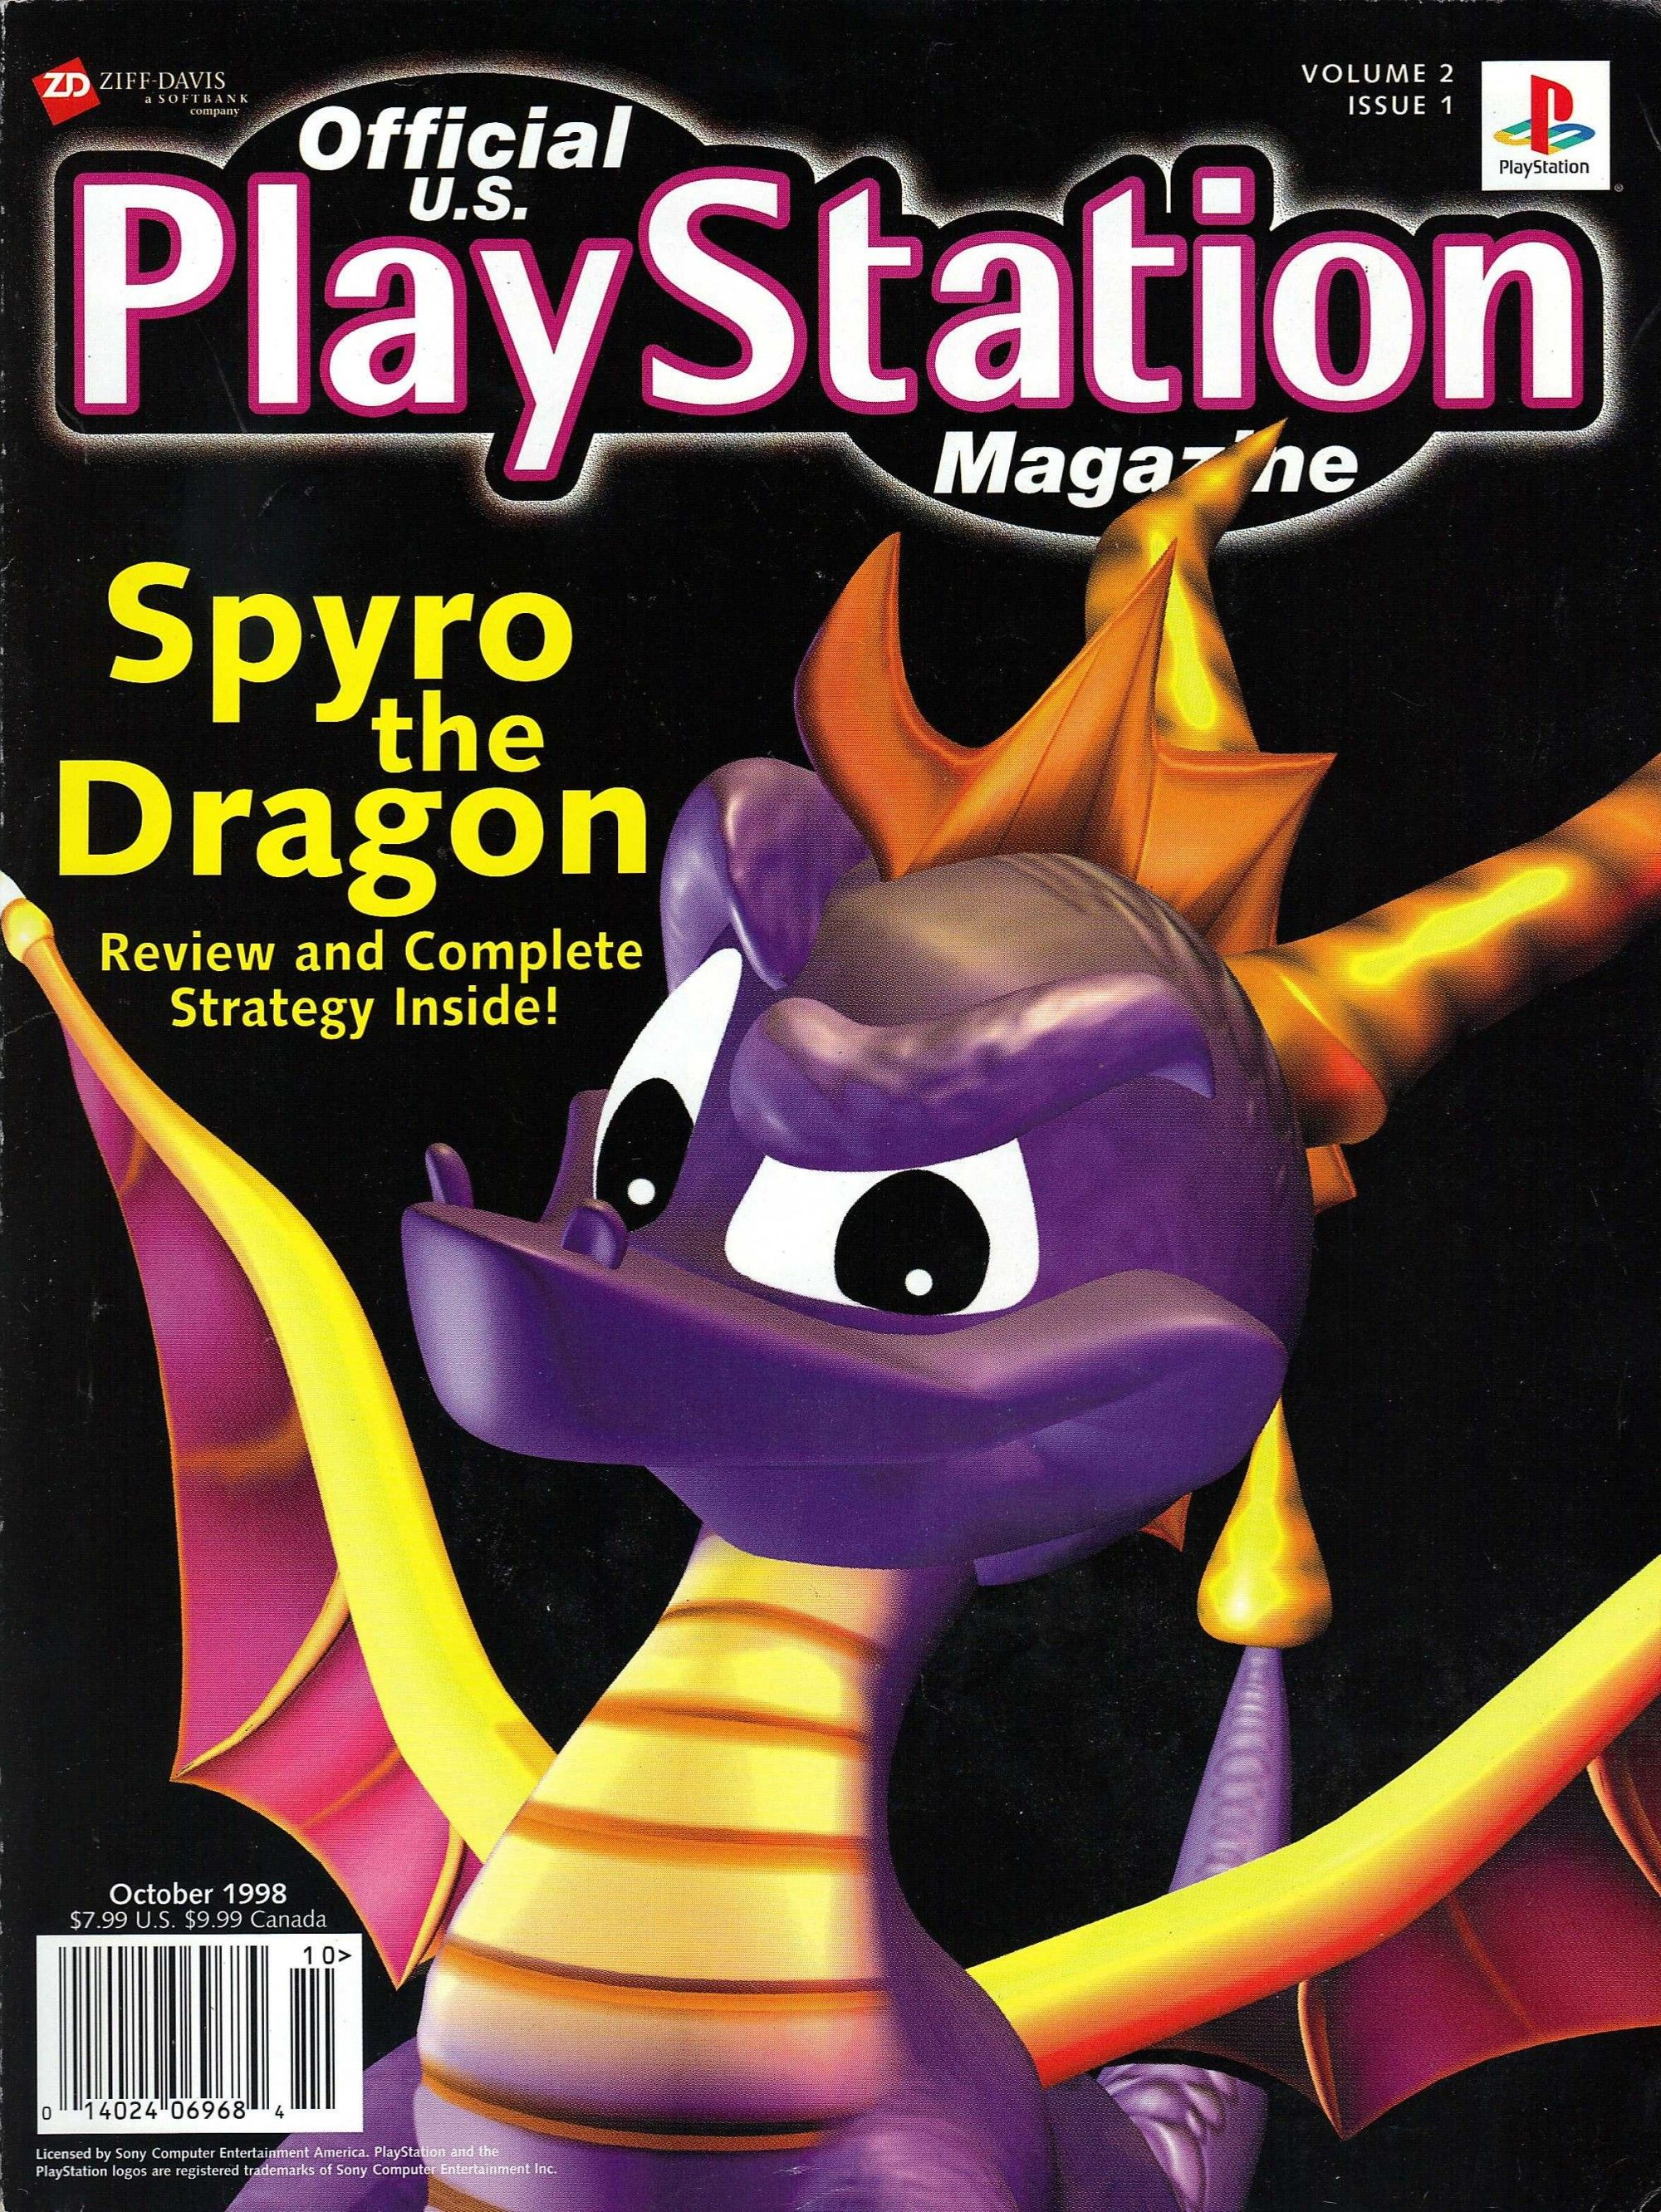 spyro the dragon an epic game | Video game magazines ...